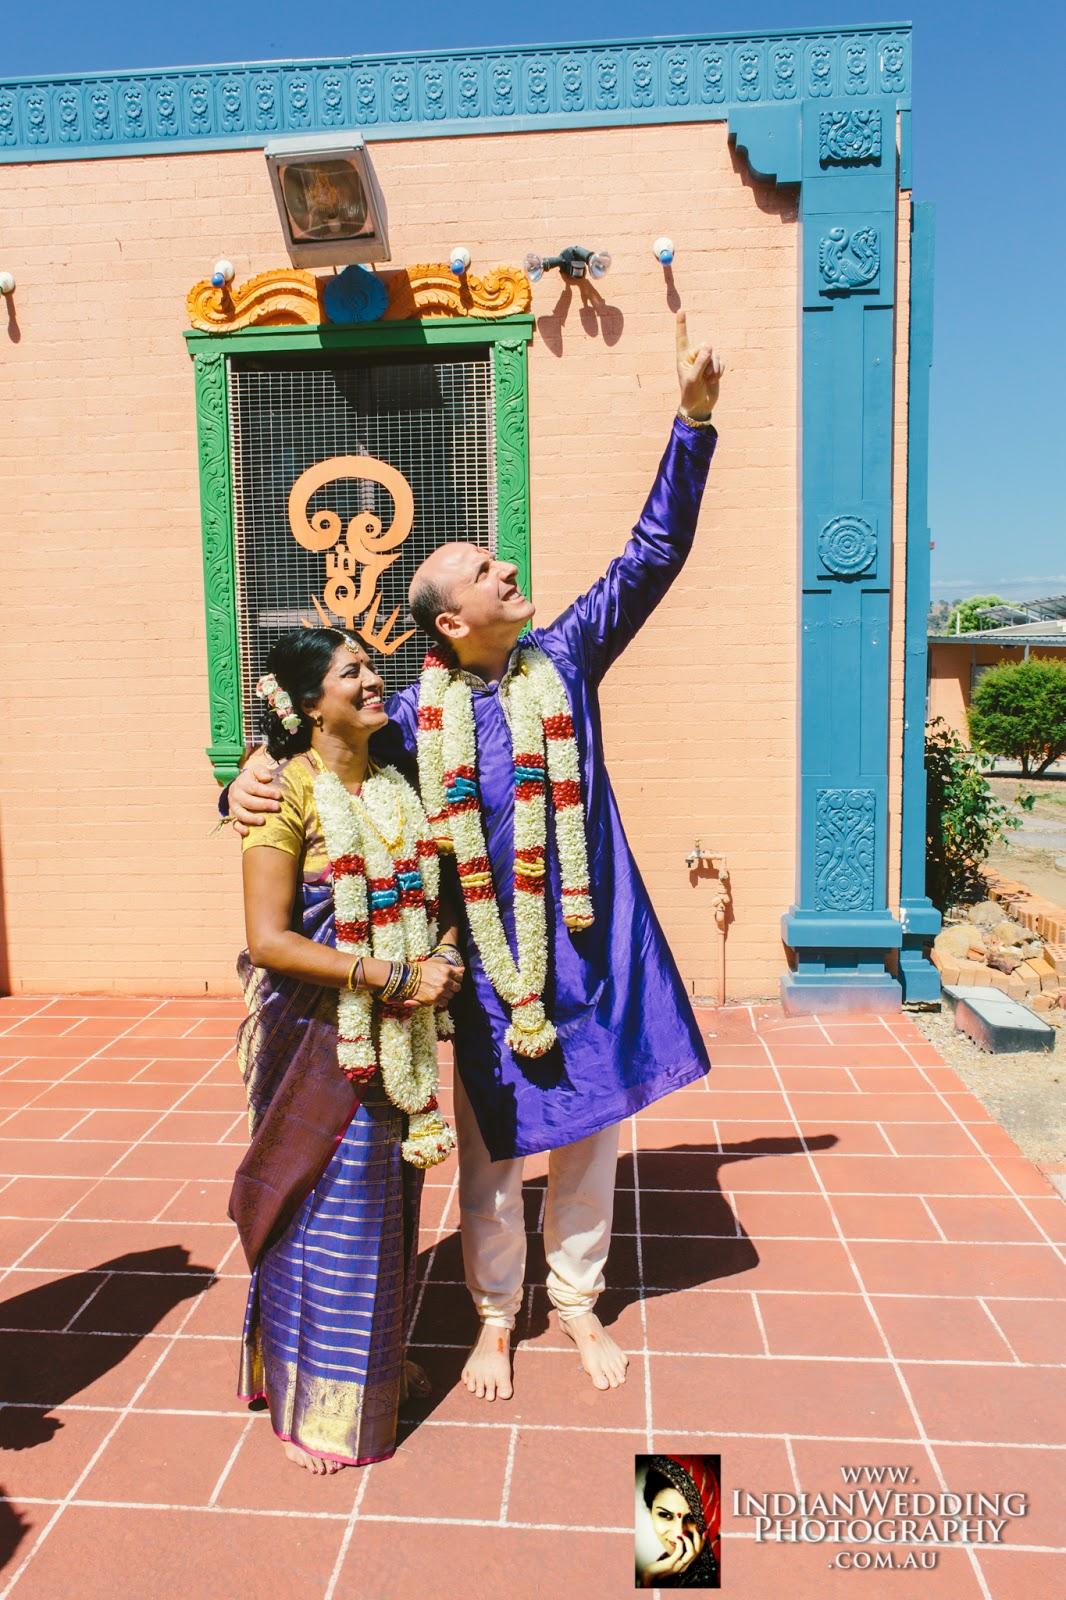 Showing of the Twin Stars Arundhati and Vashistha - Hindu Wedding Ritual